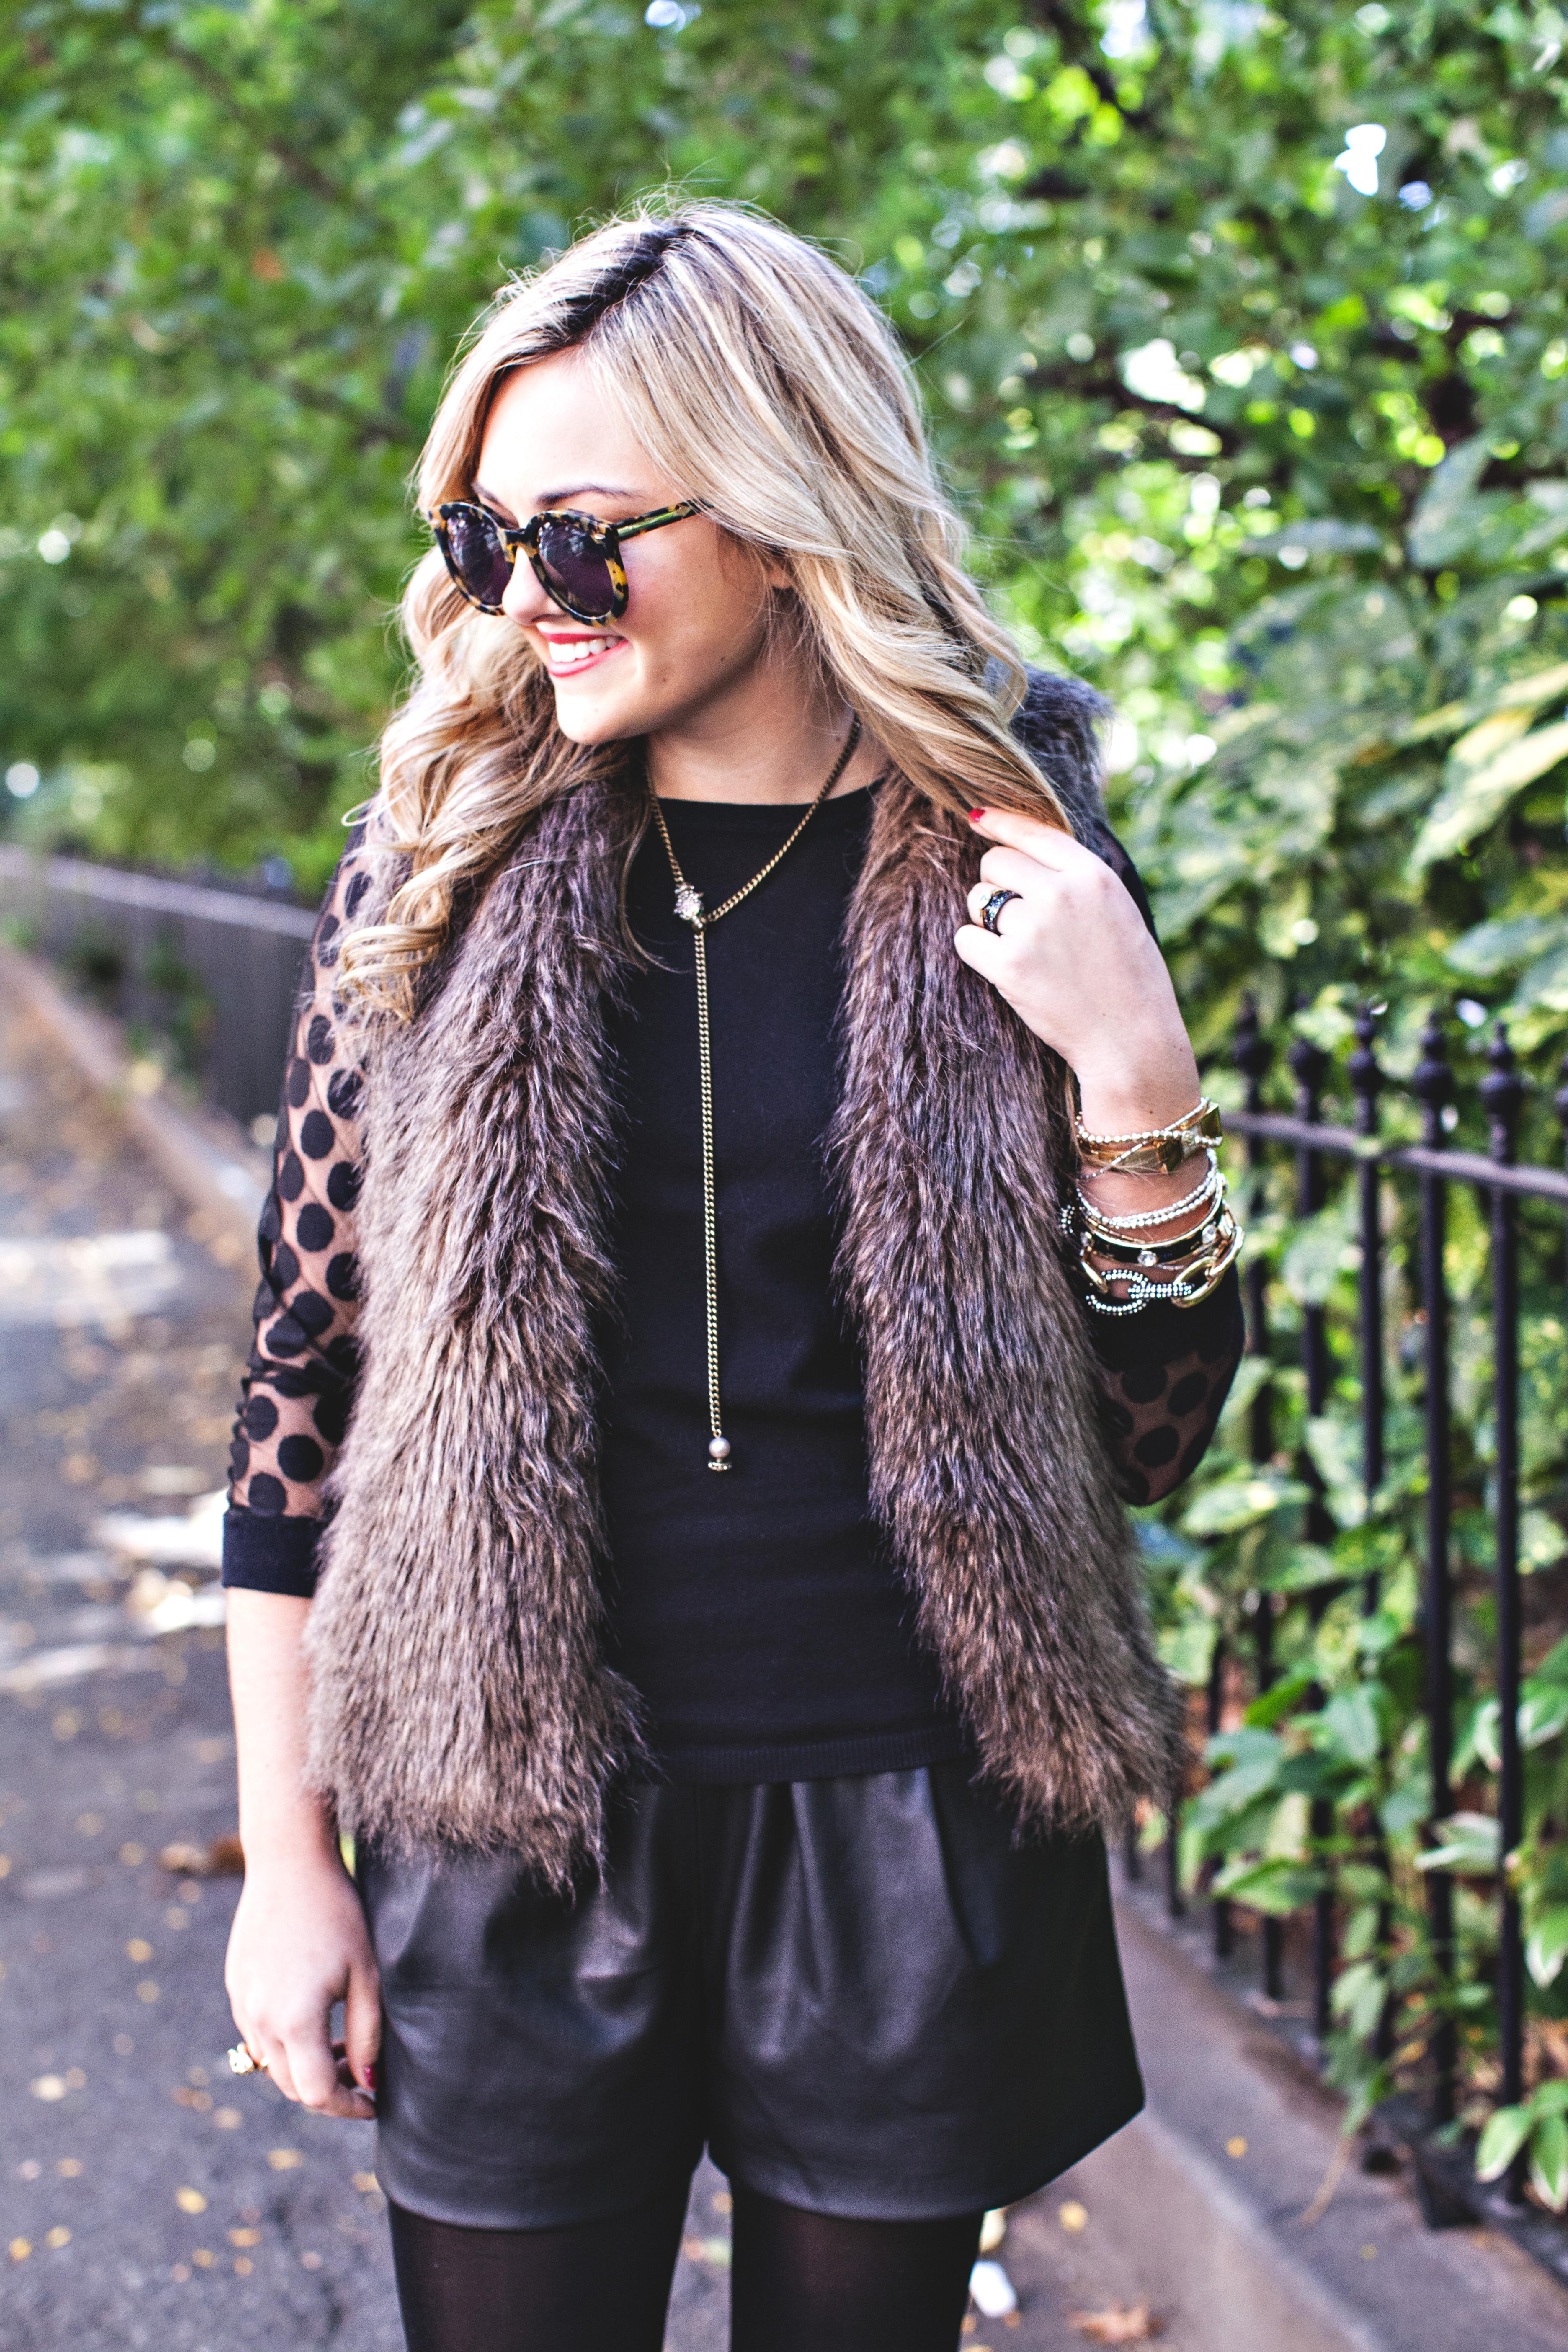 Vested Interest — bows & sequins